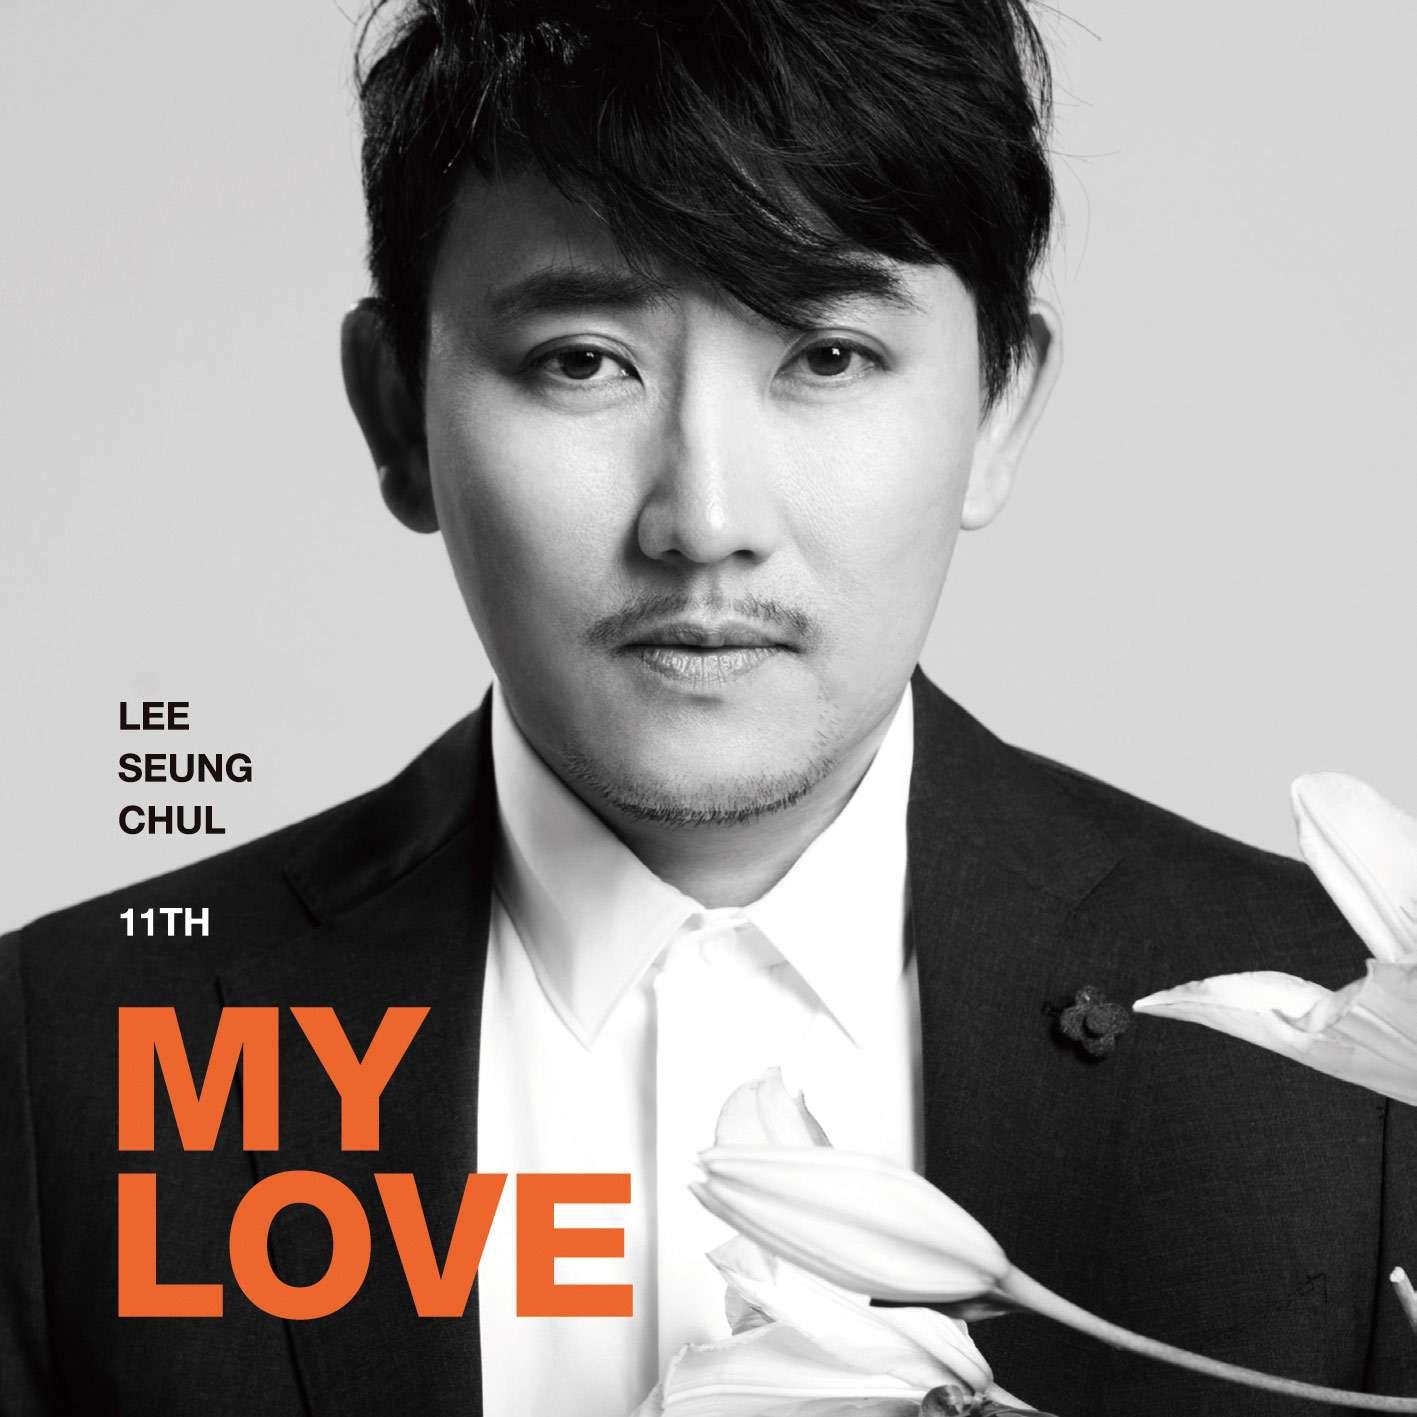 [Album] Lee Seung Chul - MY LOVE [VOL.11]